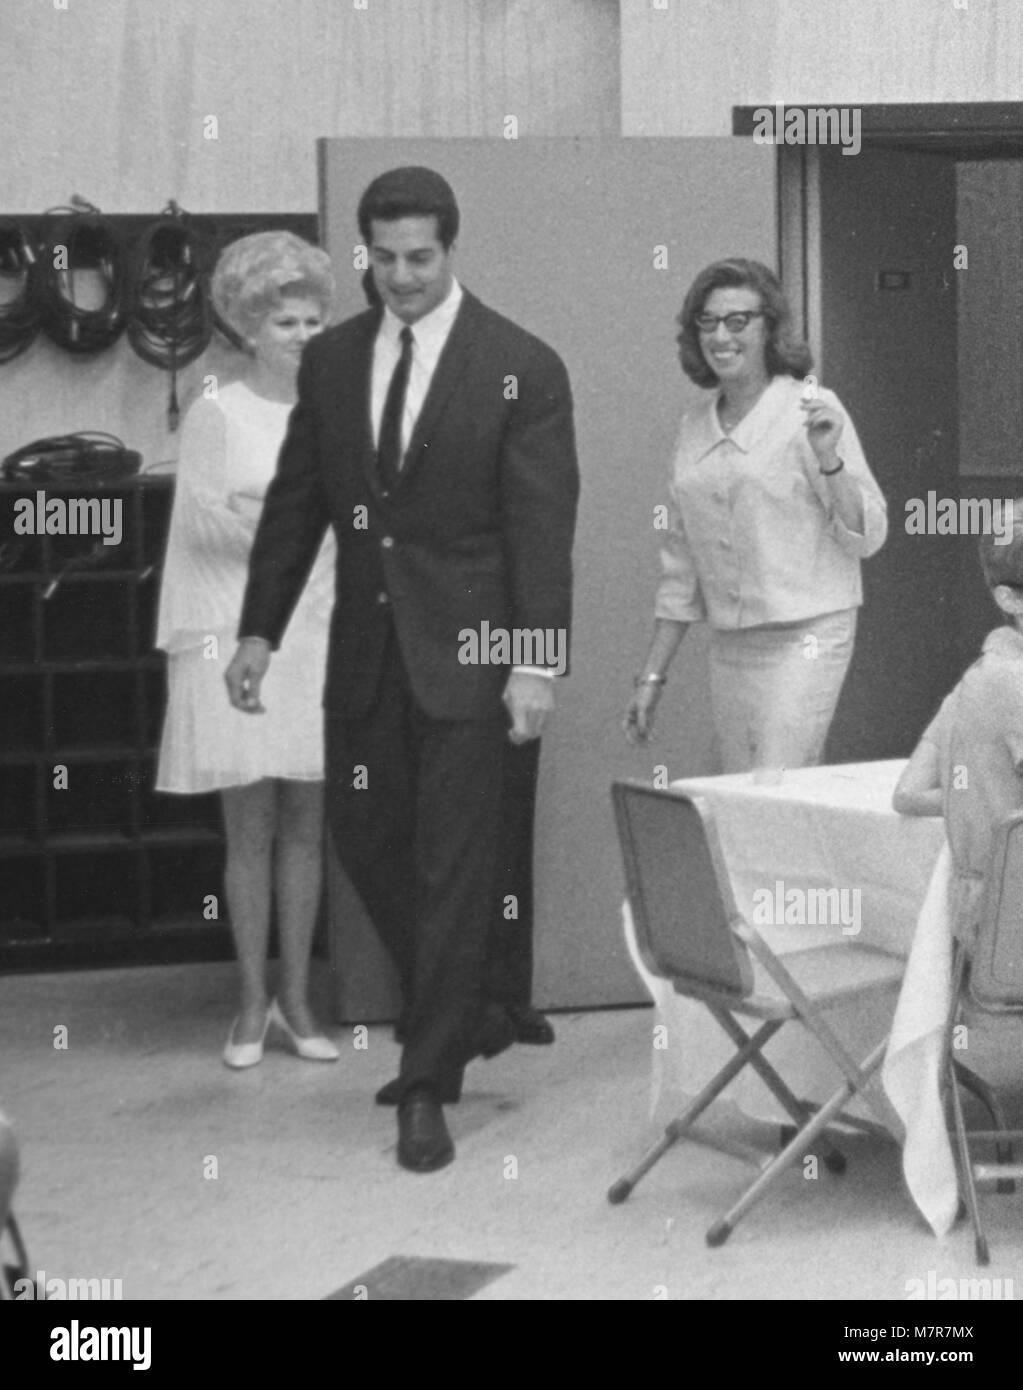 Vintage archival photograph taken in 1950 - Stock Image